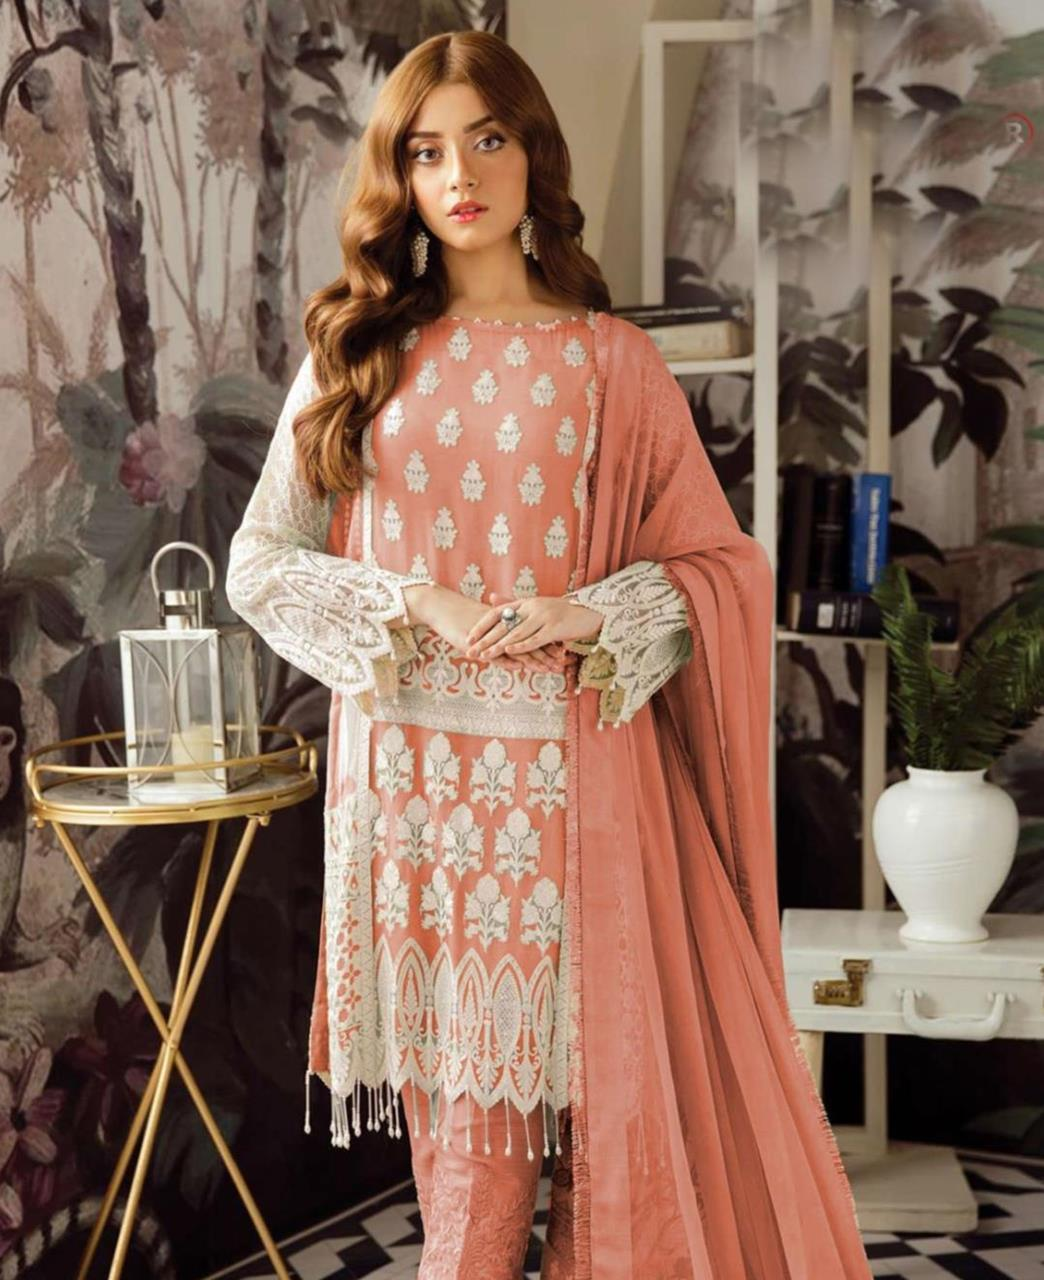 Embroidered Georgette Straight cut Salwar Kameez in Peach